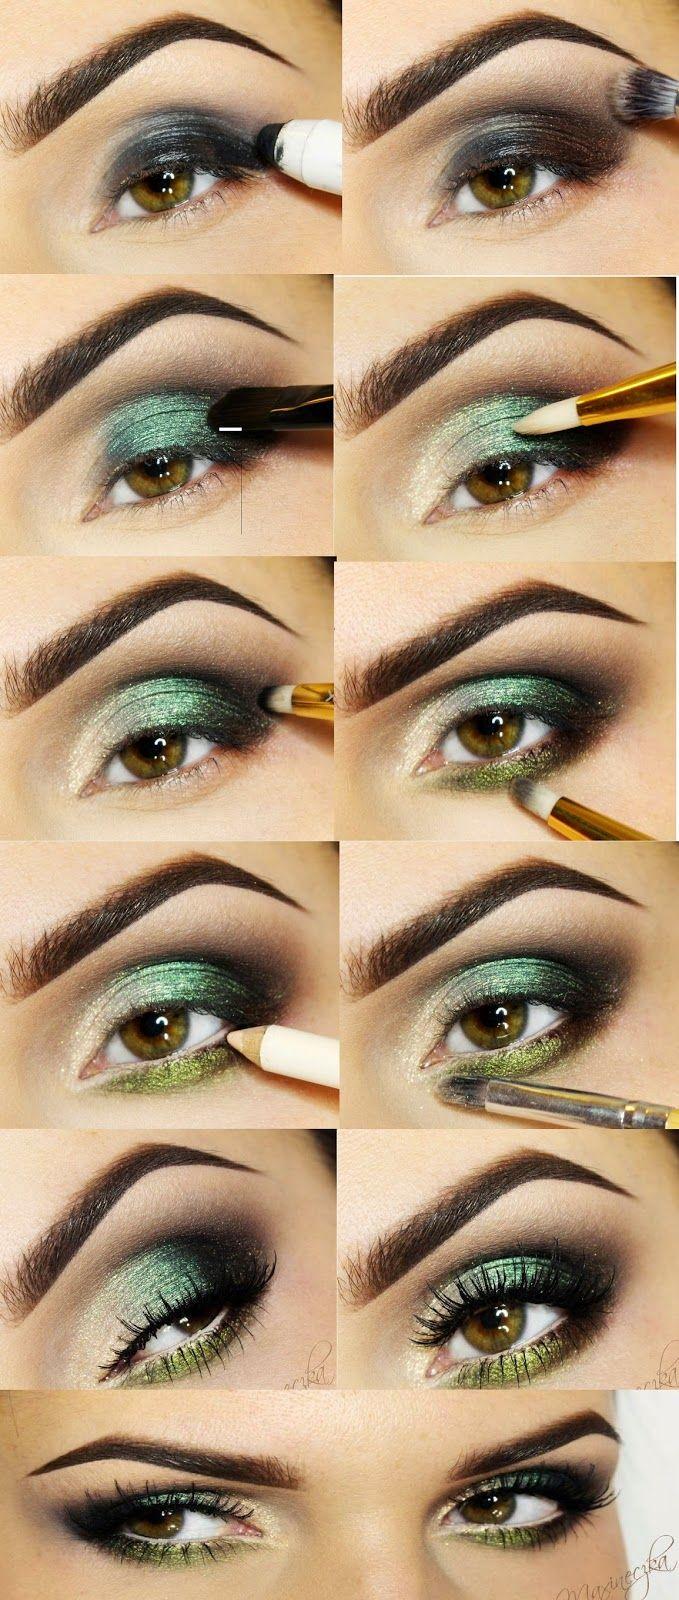 Green eye shades makeup tutorials step by step best lolus green eye shades makeup tutorials step by step best lolus makeup fashion step fashion eye makeup baditri Images